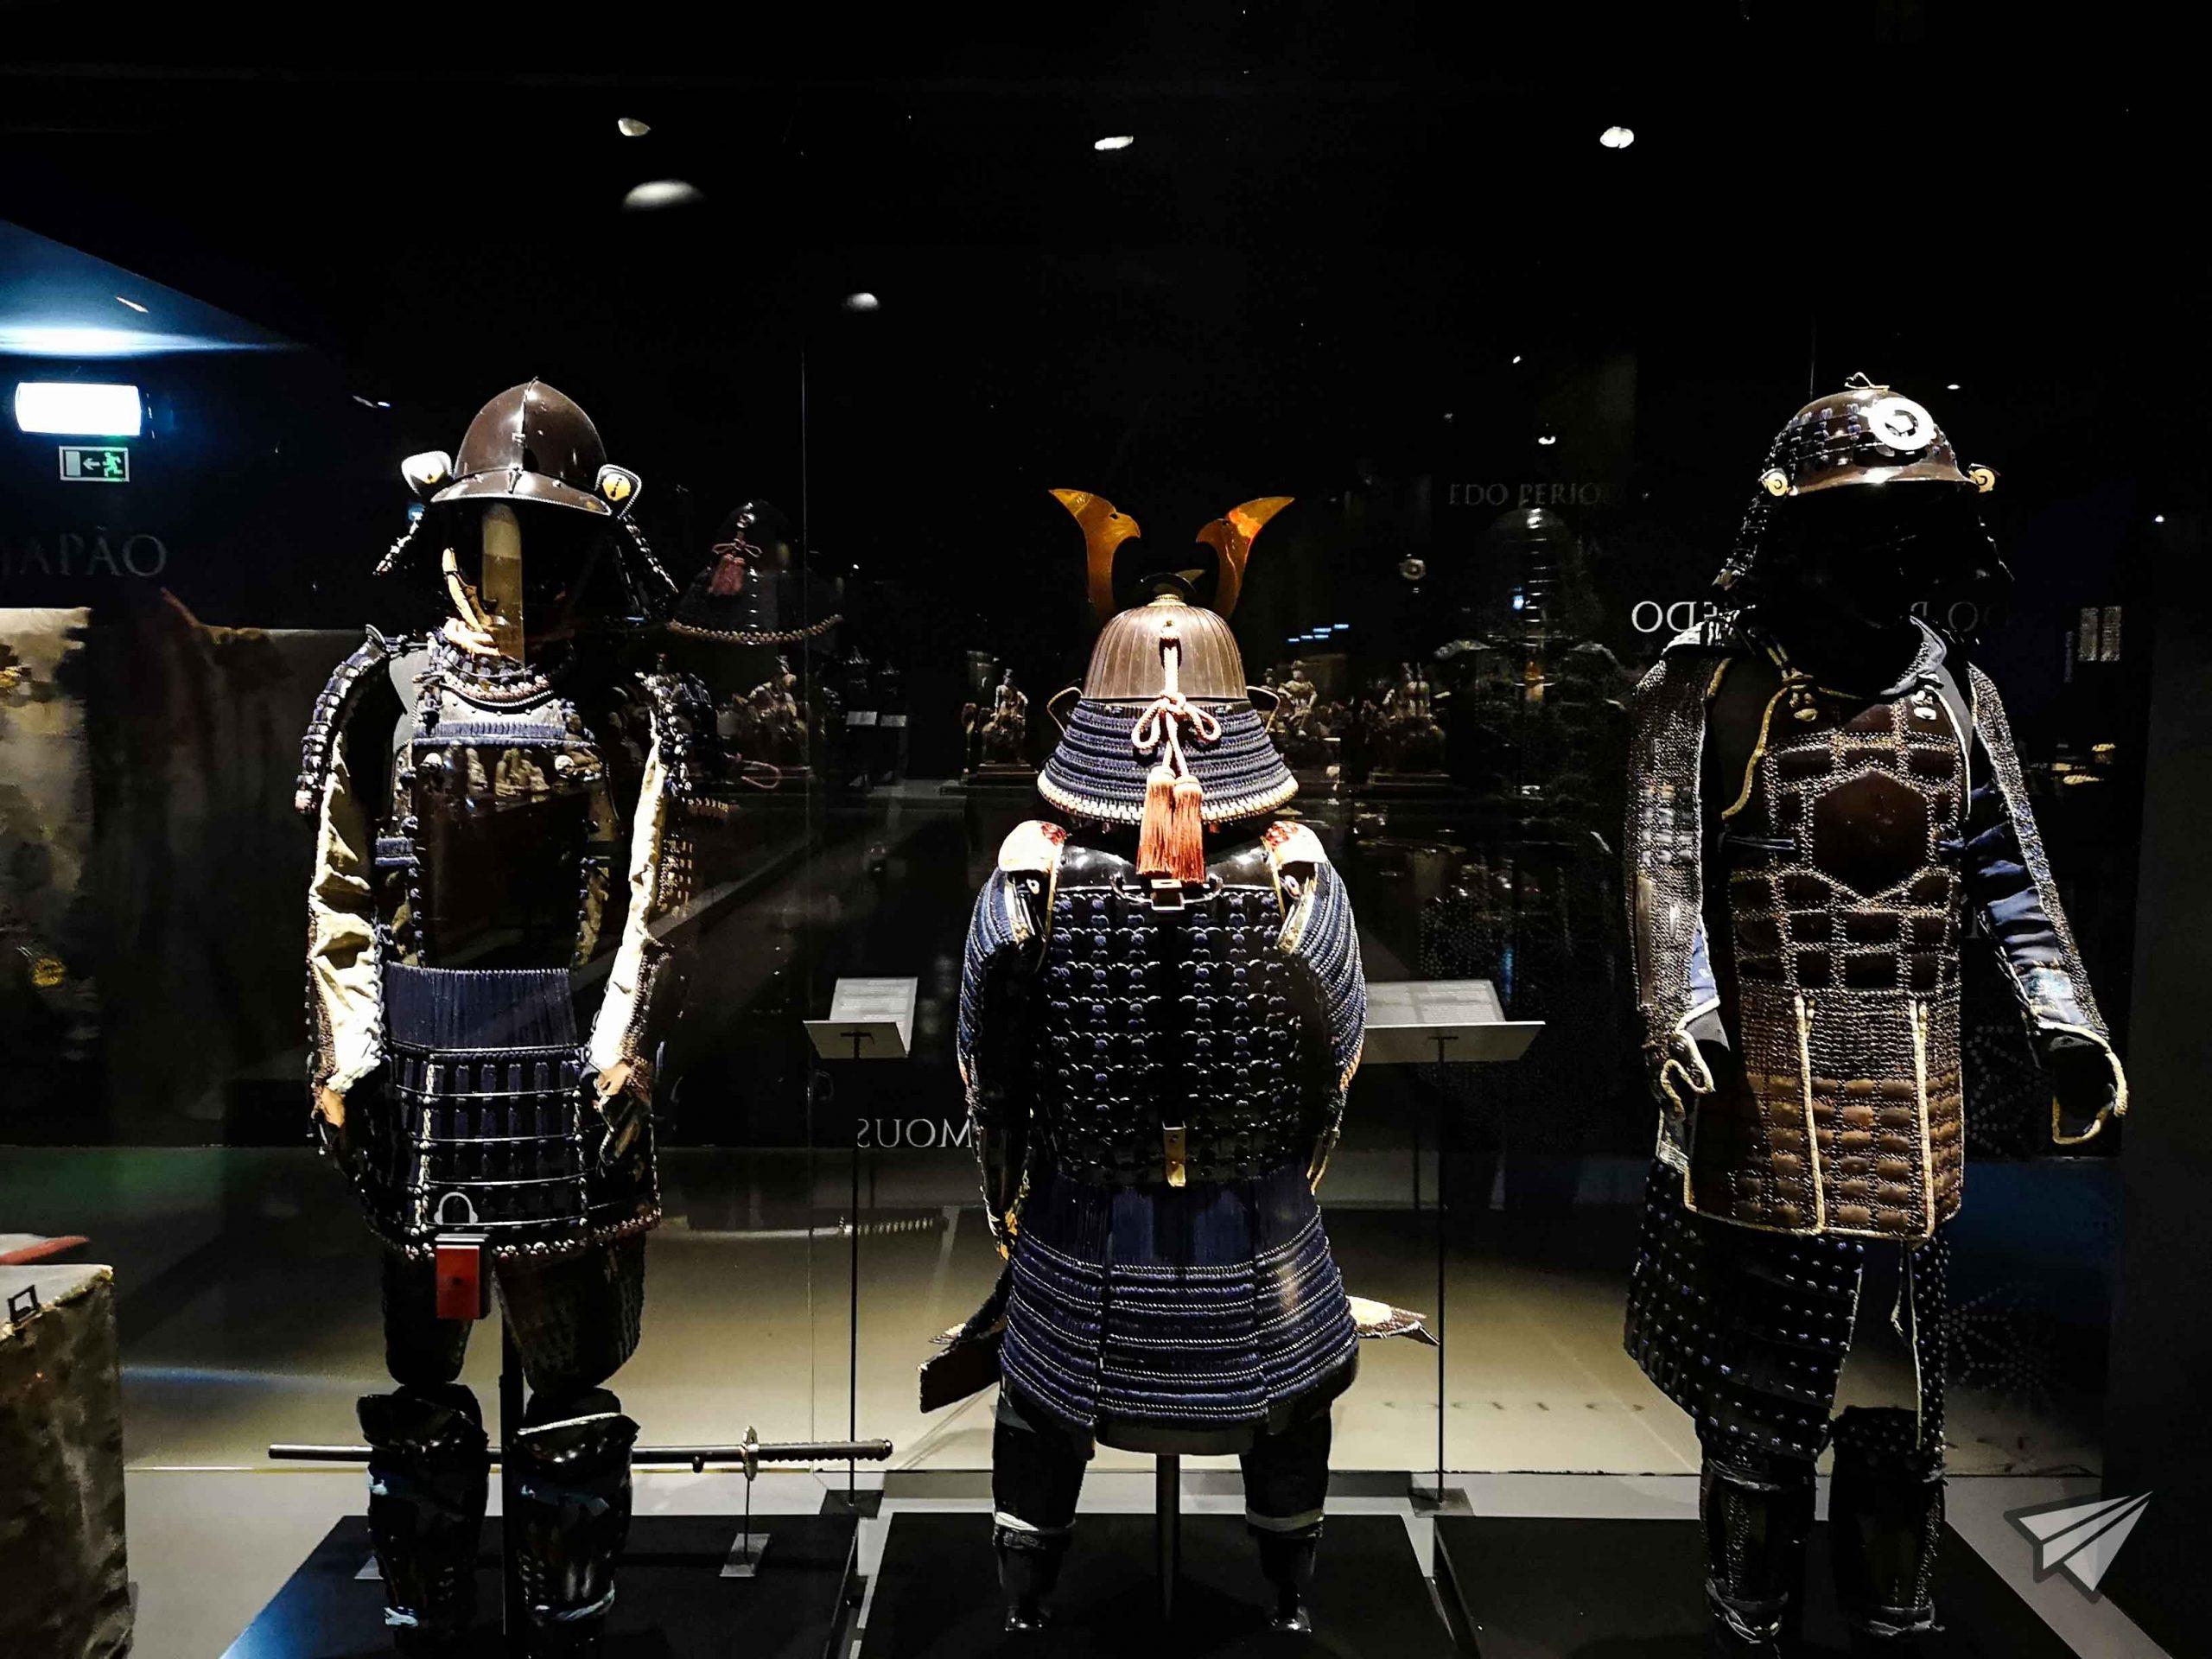 Museu do Oriente costumes